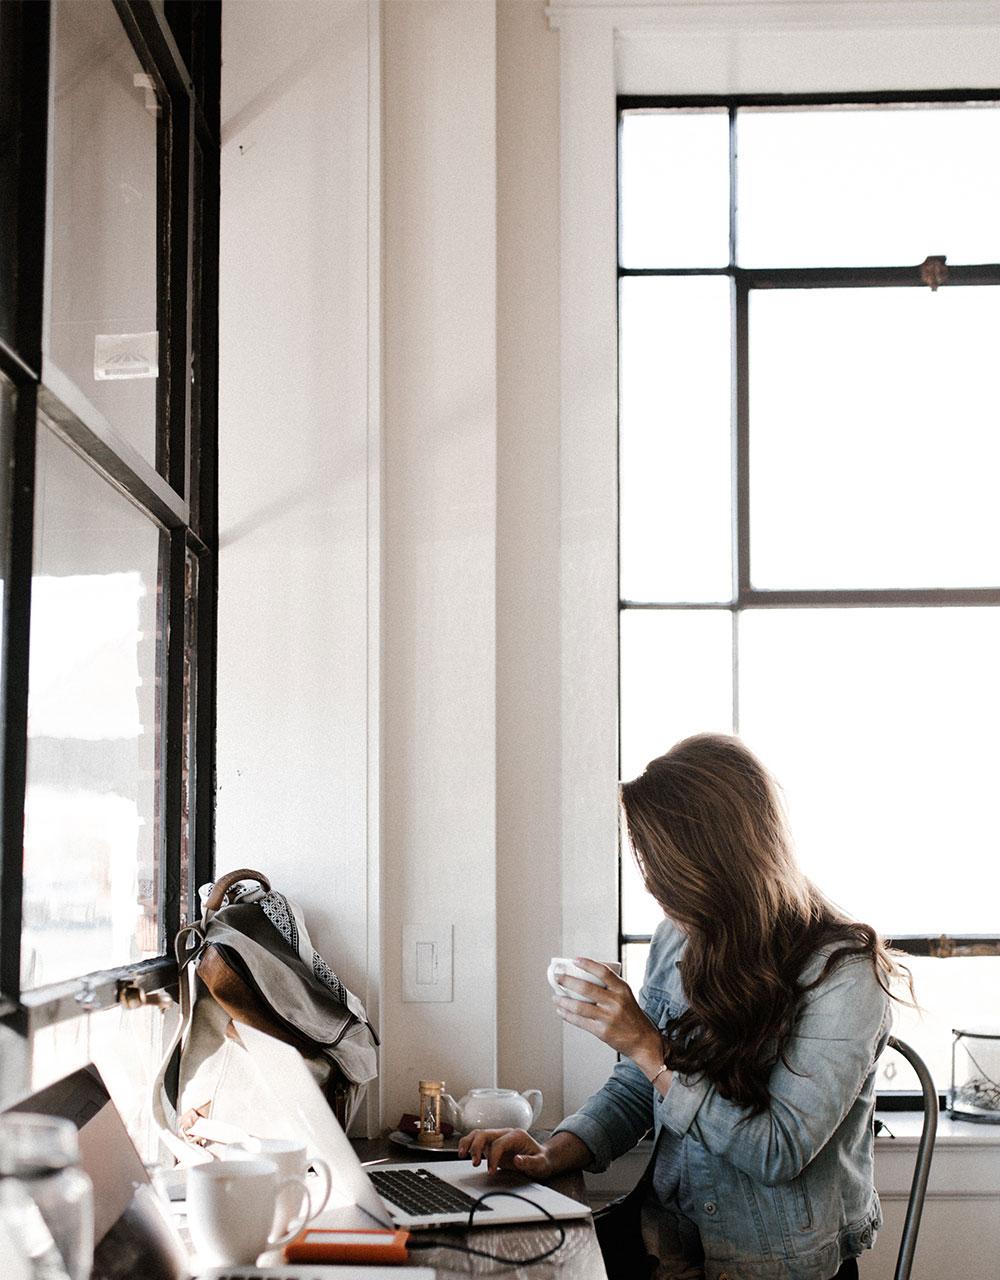 are_women_tech_savvy.jpg